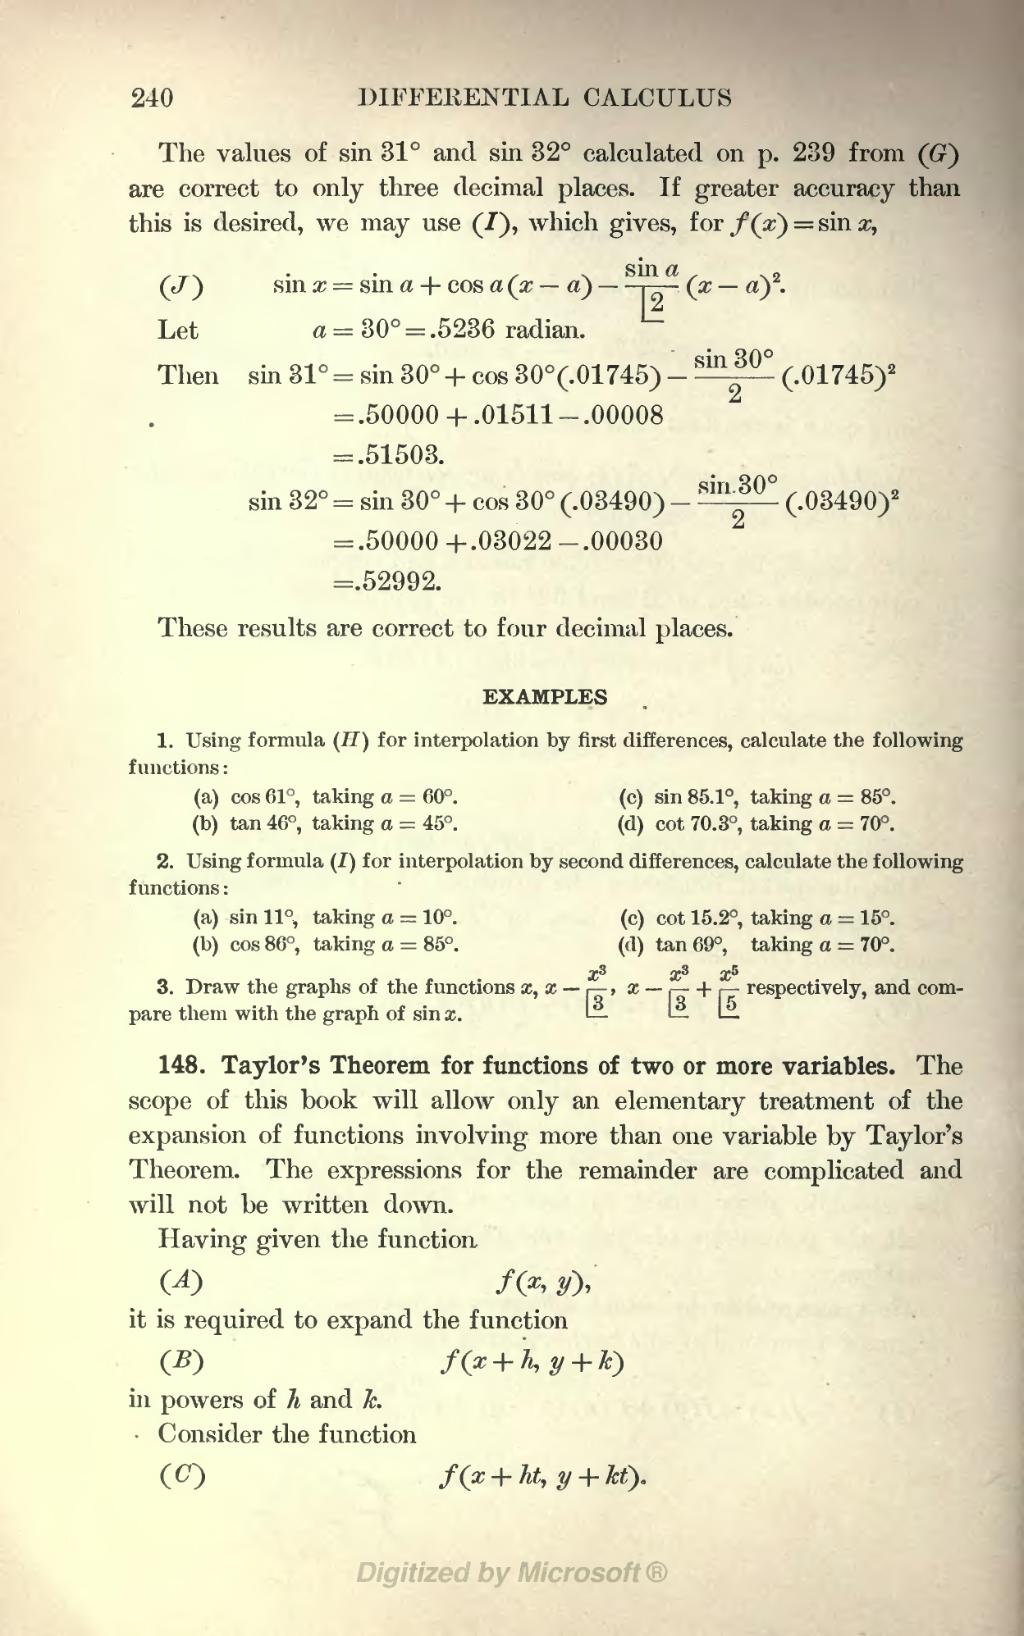 integral calculus book pdf free download